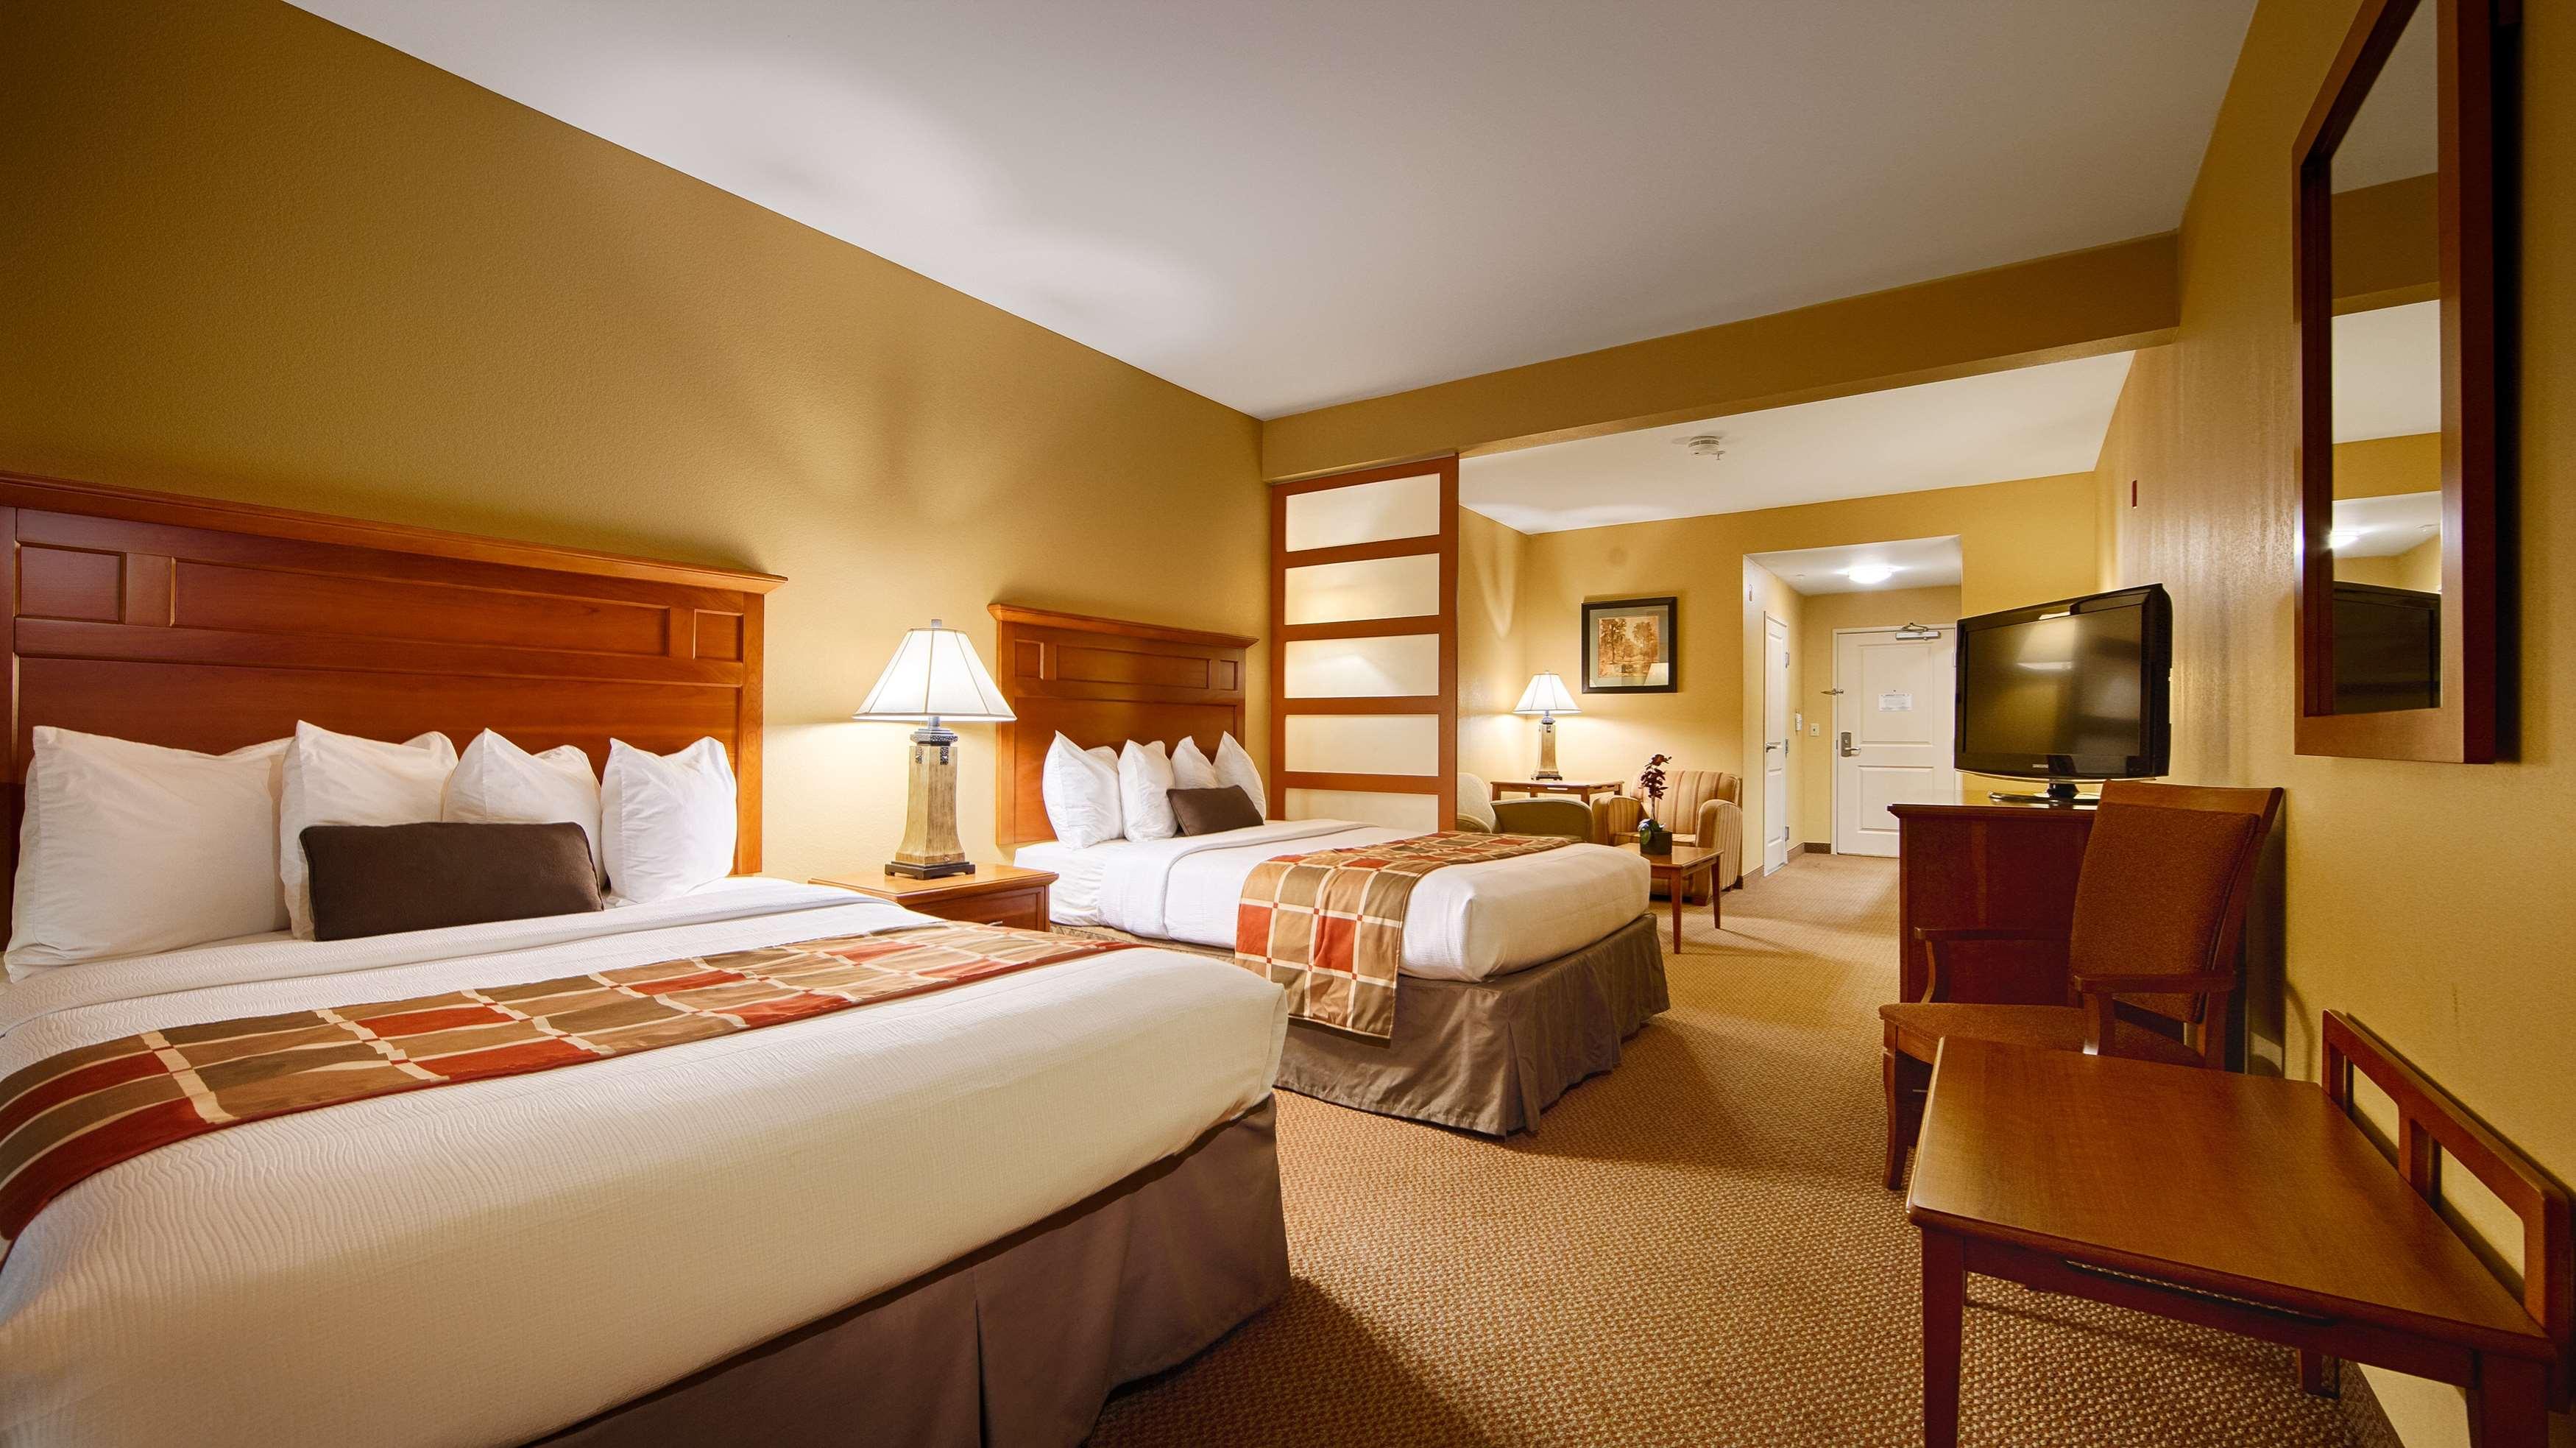 Best Western Plus University Park Inn & Suites image 20